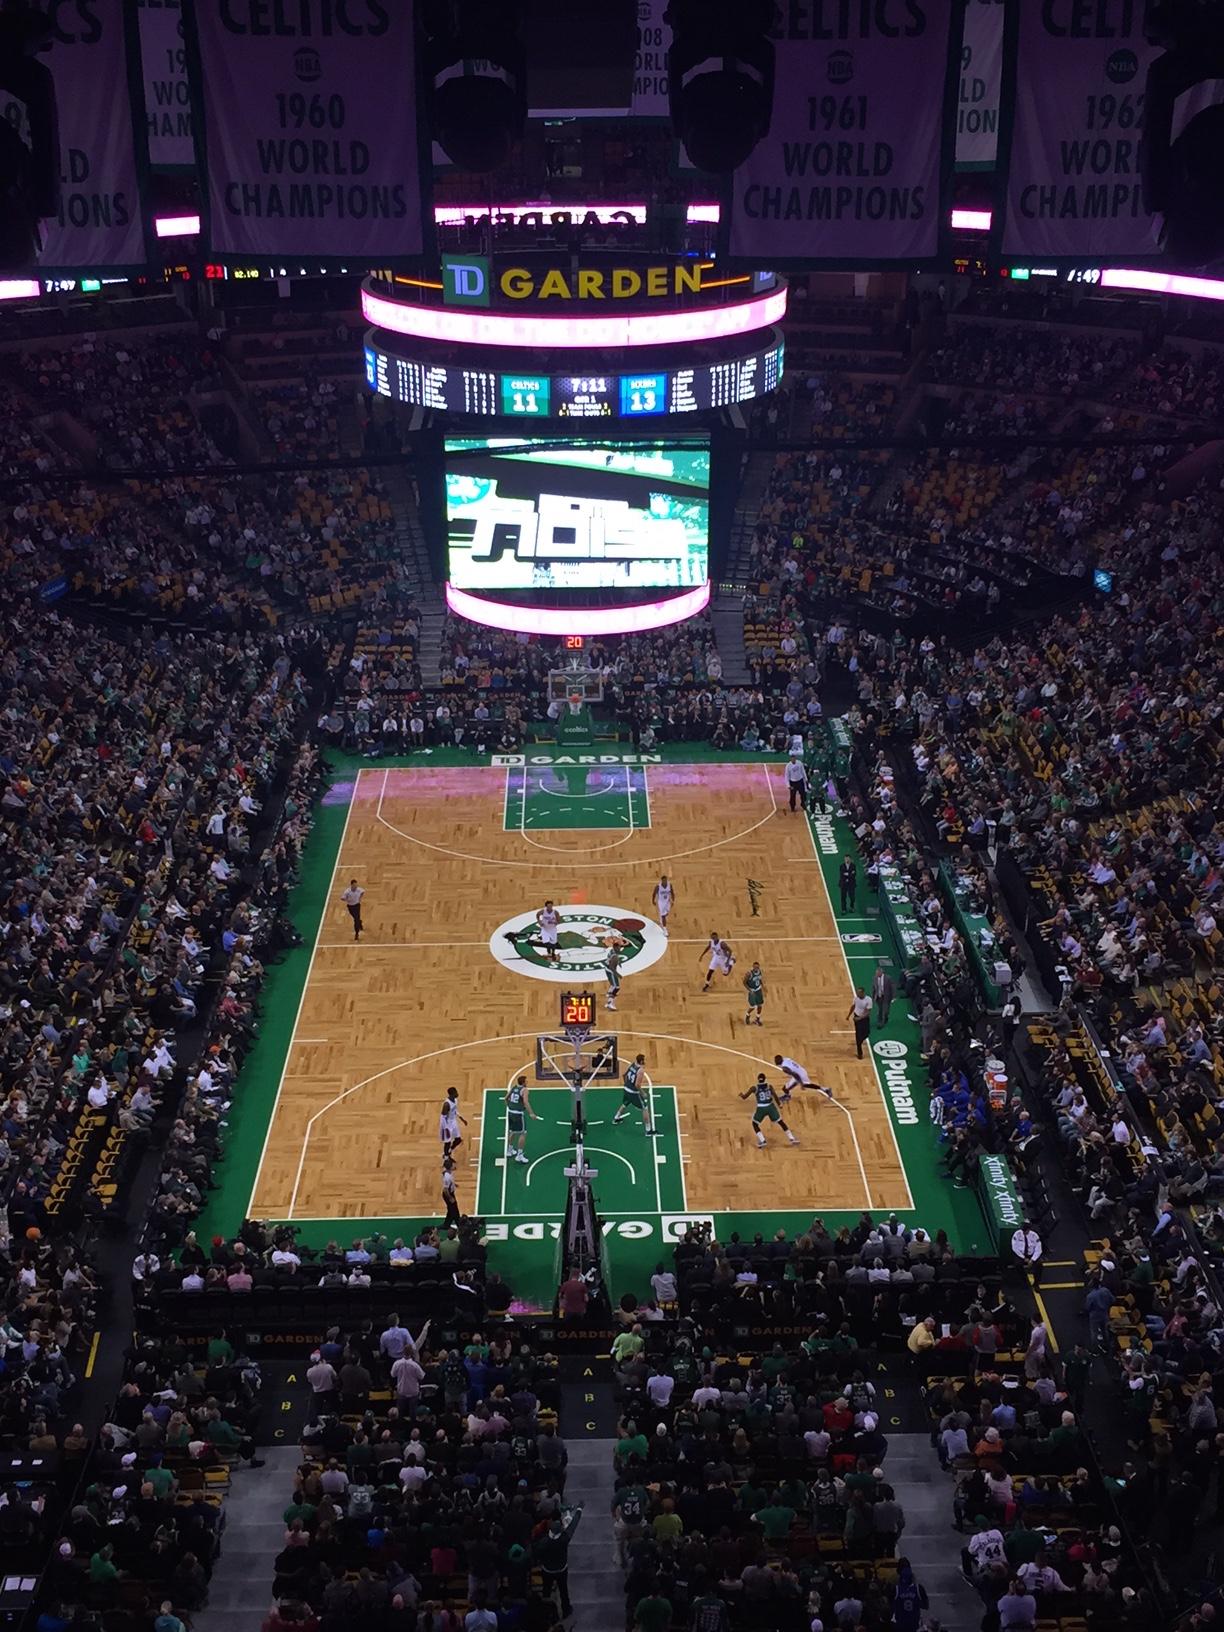 nba地板-波士顿凯尔特人队新的木地板篮球场图片